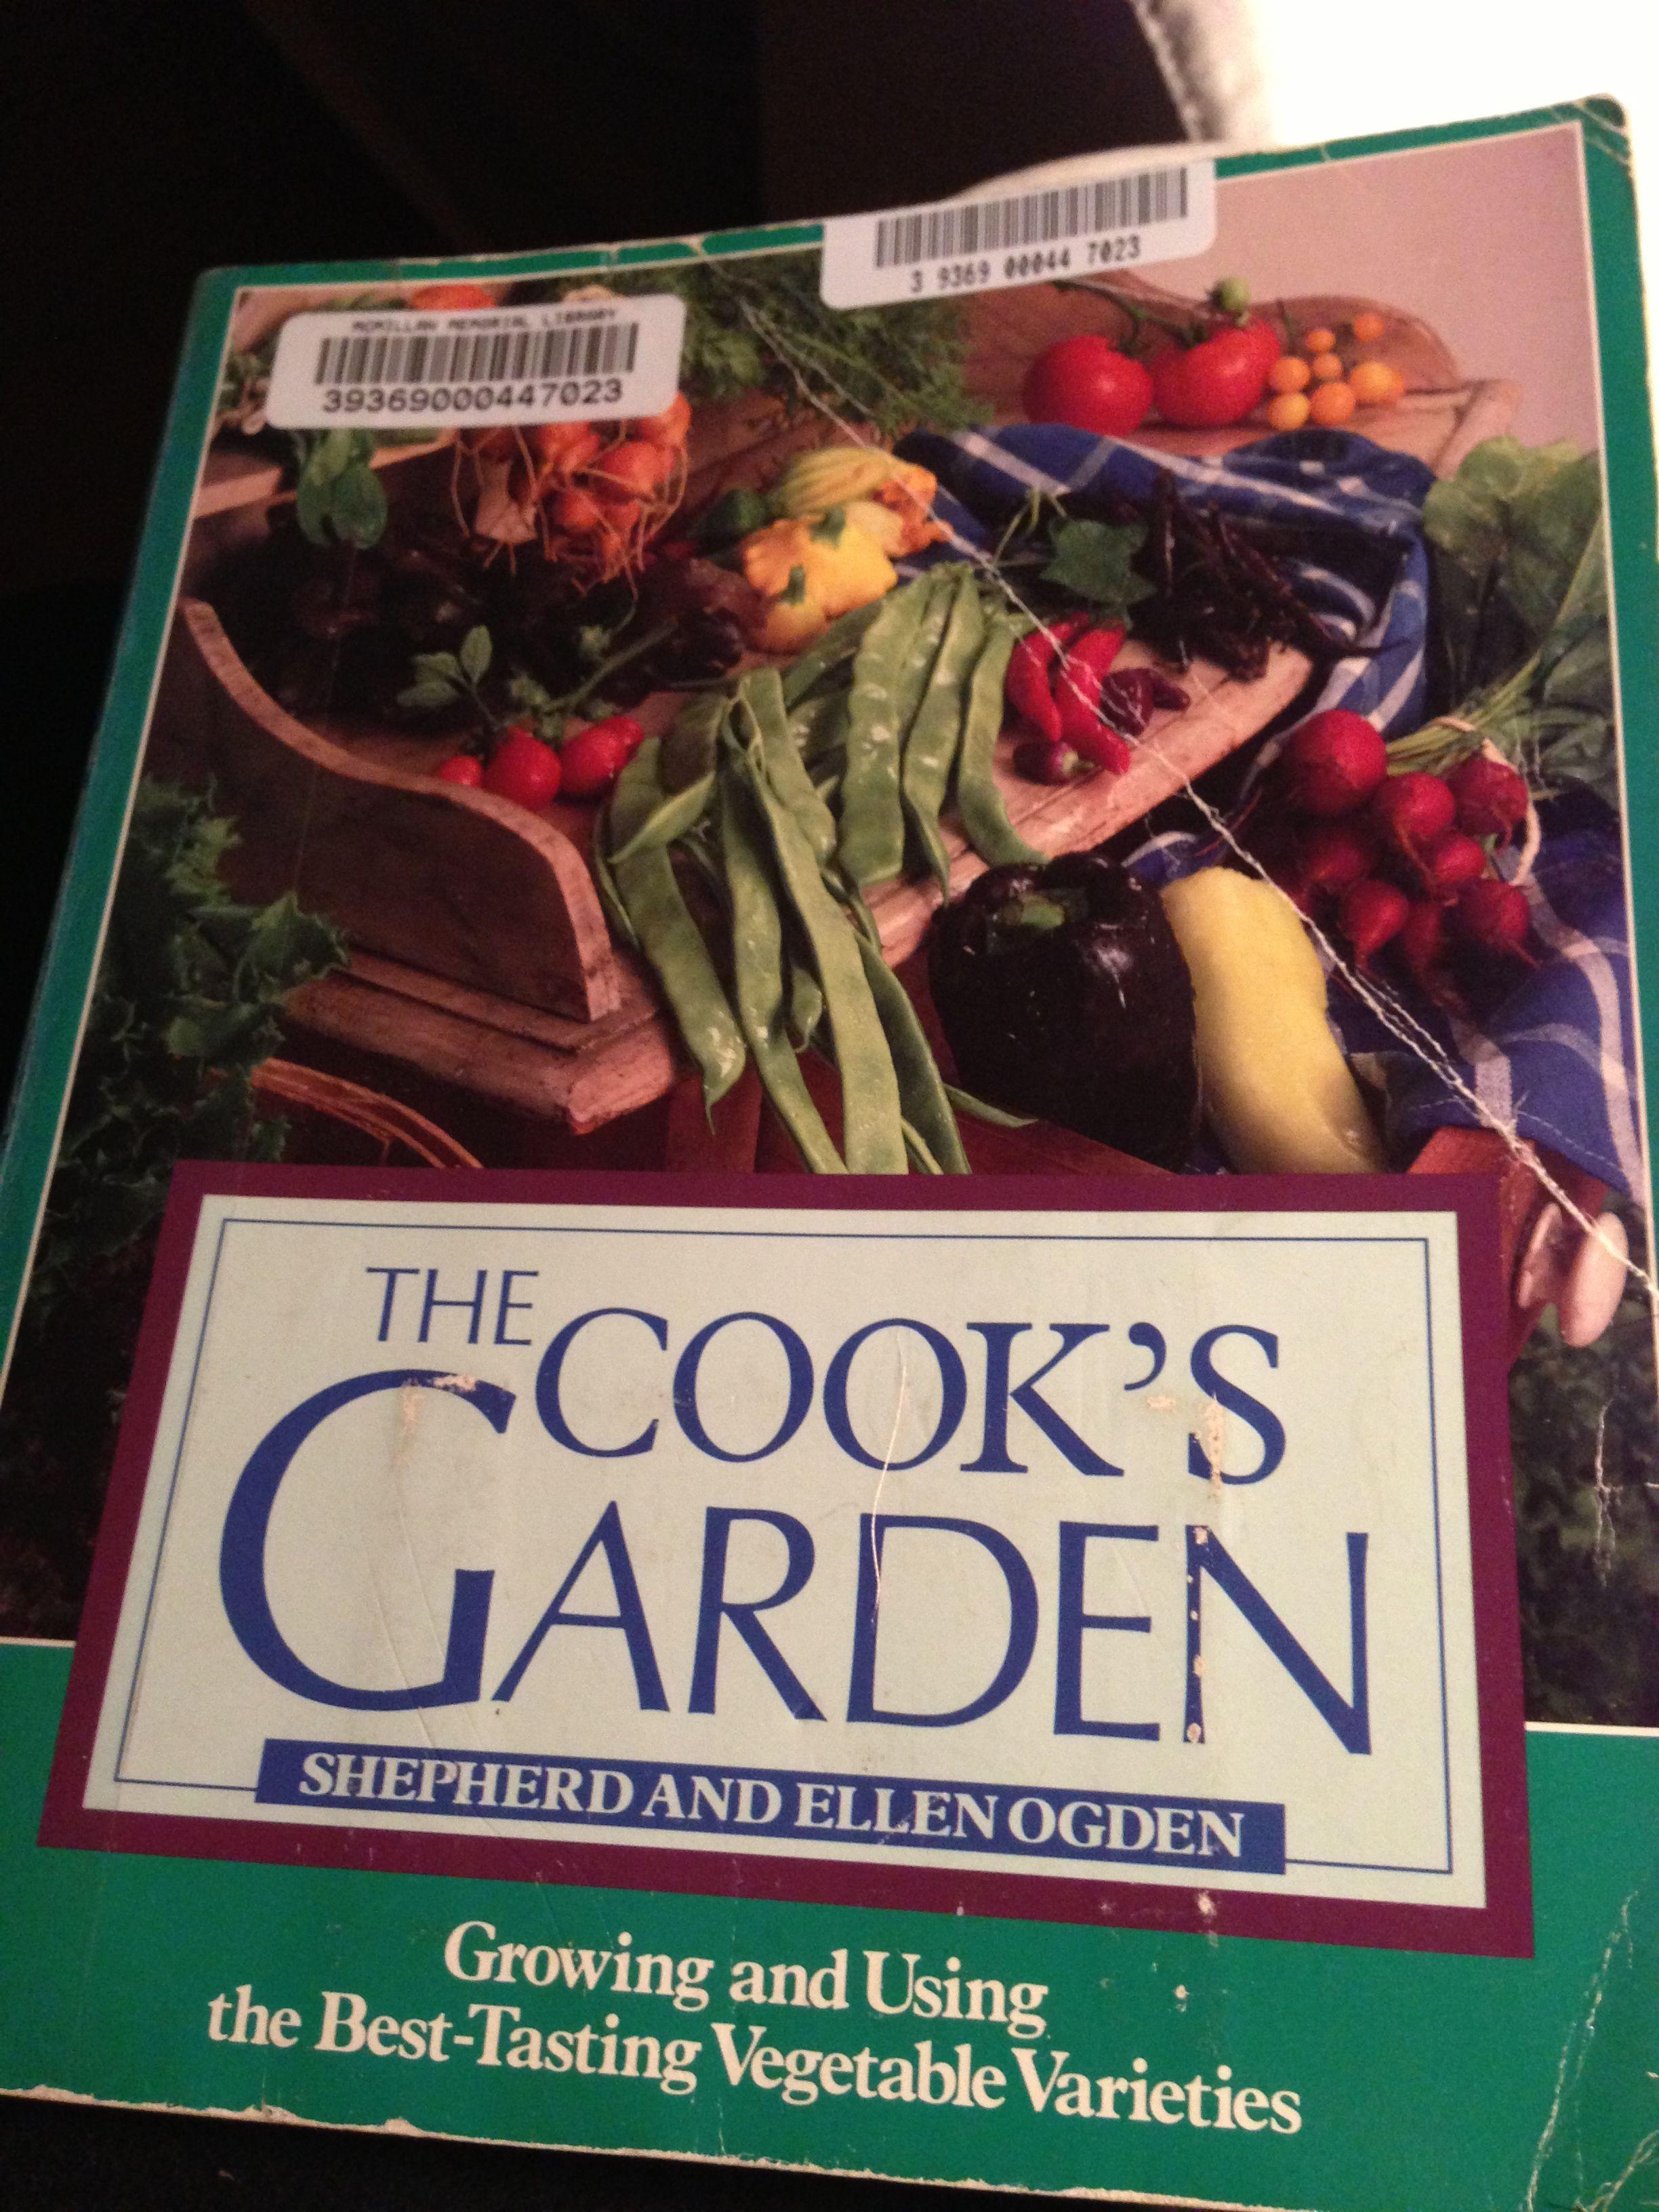 6154036762346191850ee9fe6d3b037c - Radical Gardening Politics Idealism And Rebellion In The Garden